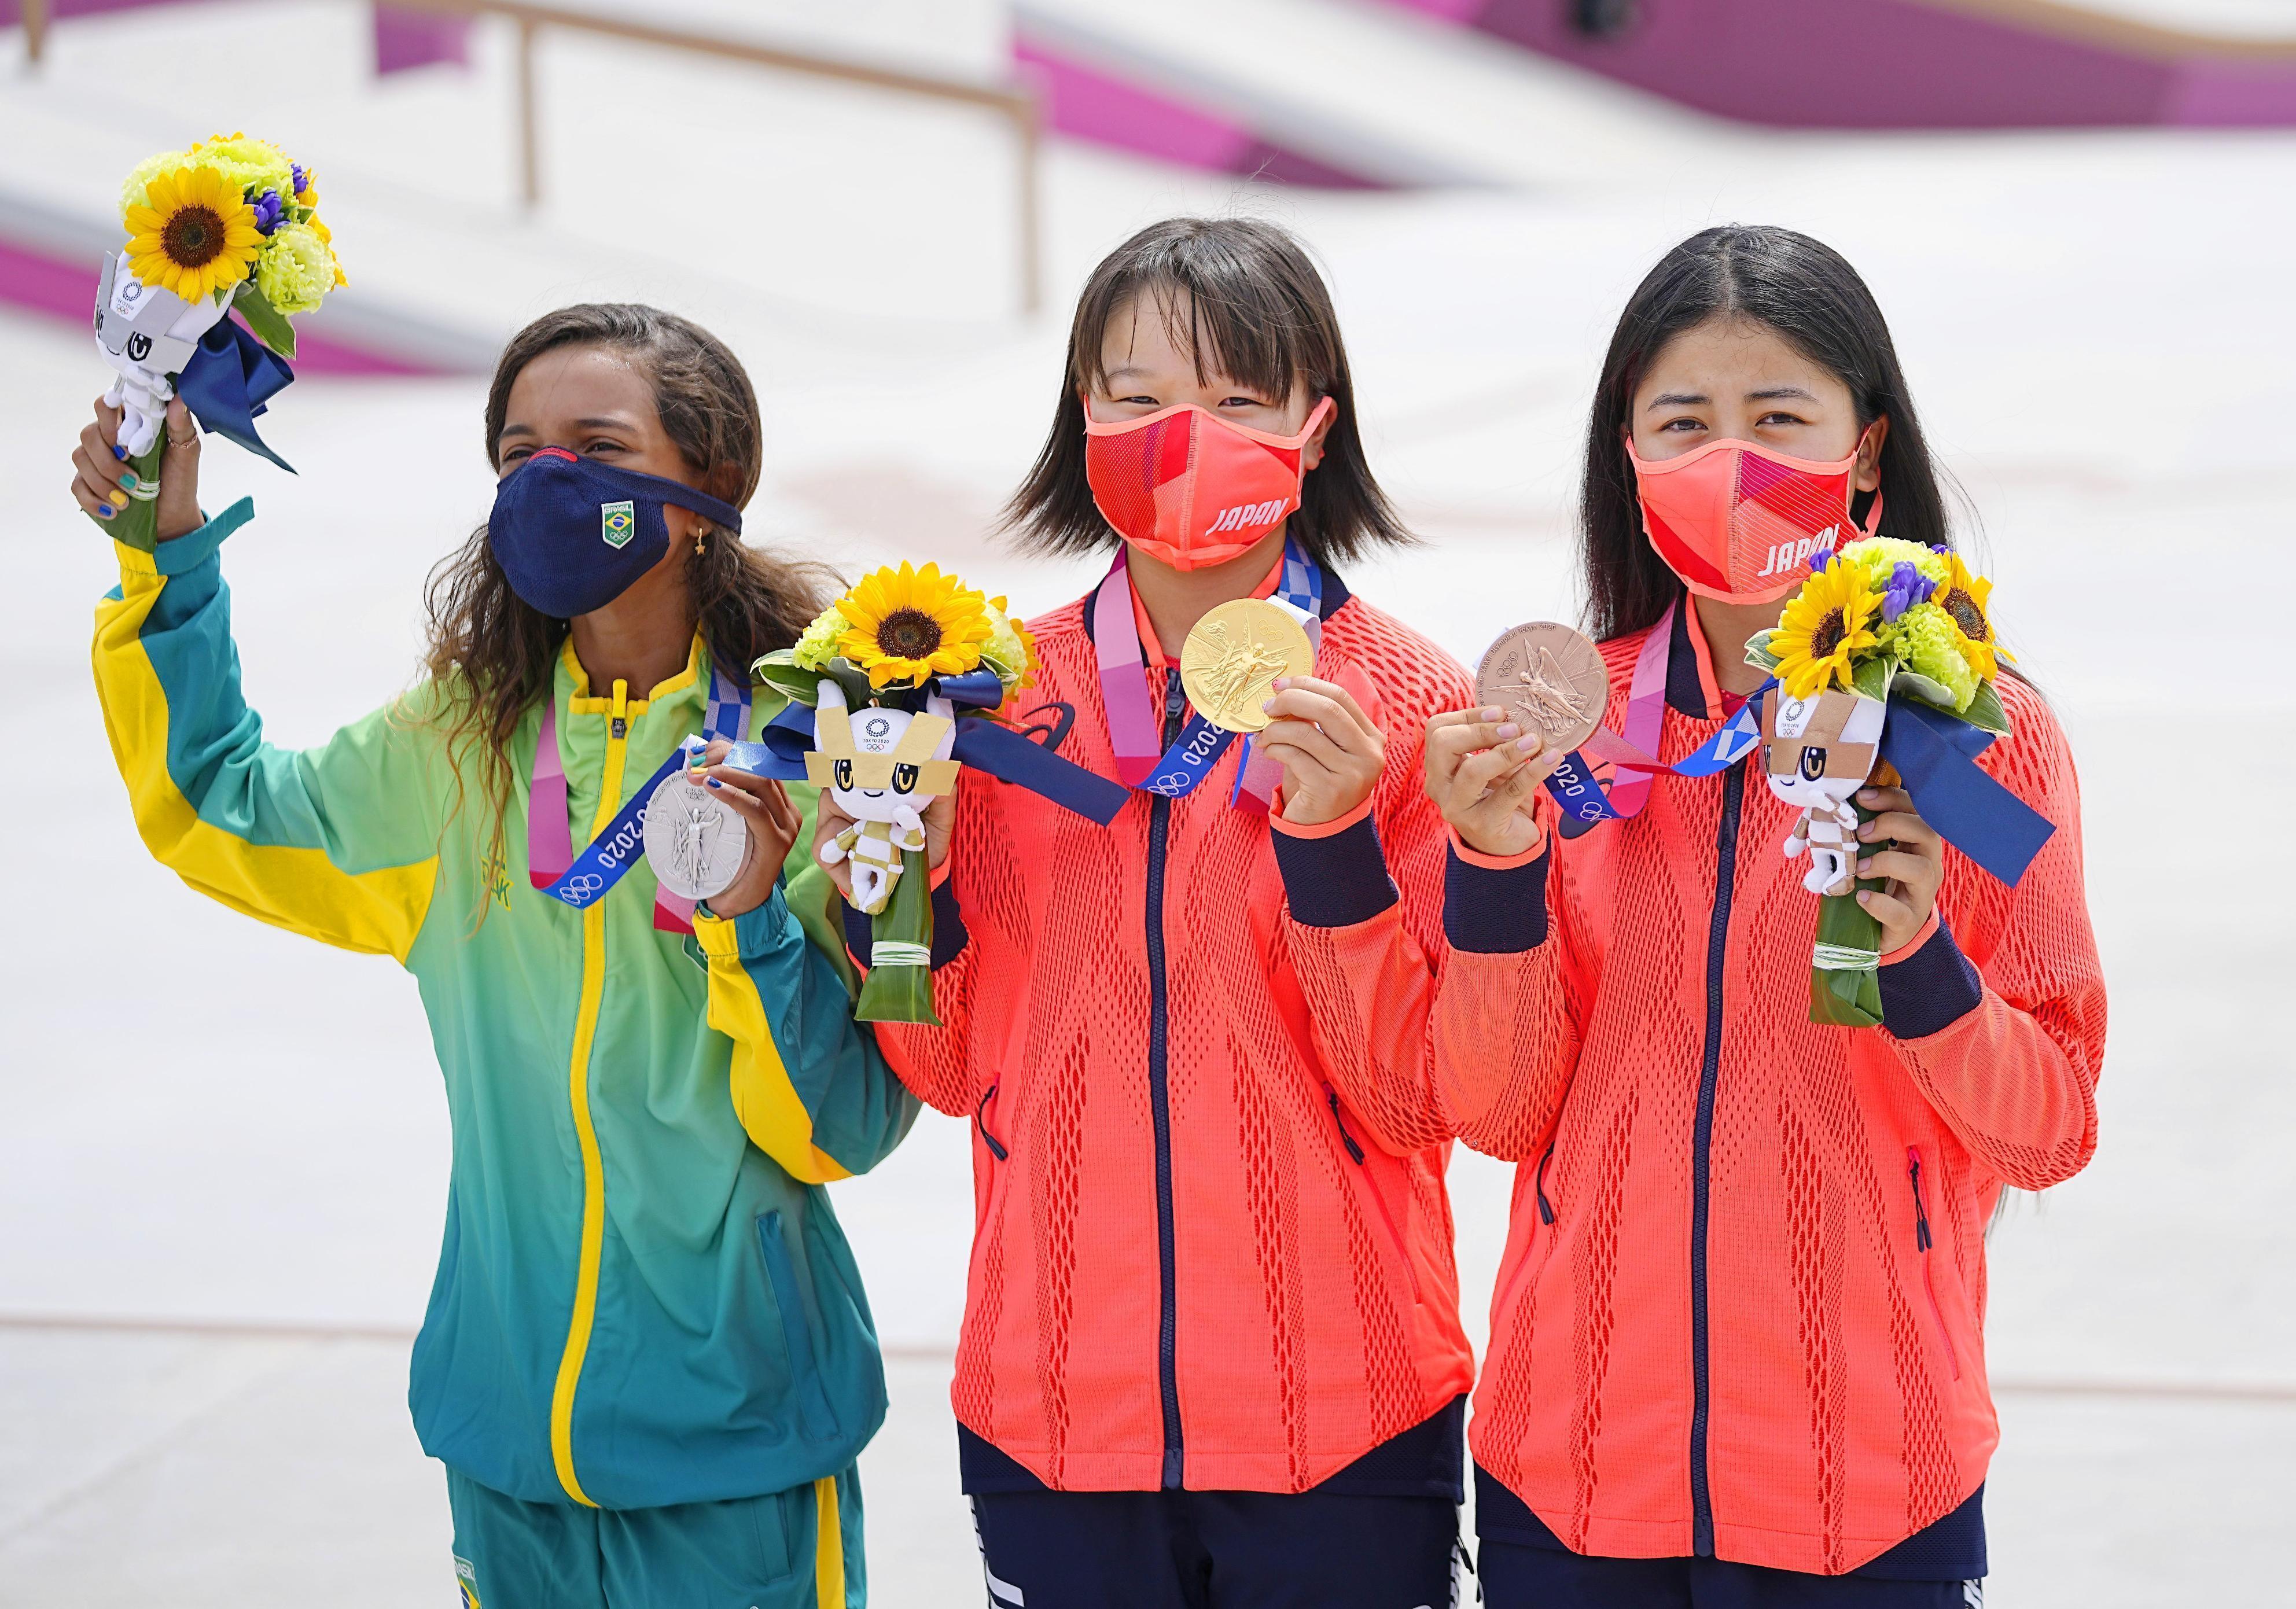 Momiji Nishiya (C) of Japan poses with her street skateboarding gold medal at the Tokyo Olympics on July 26, 2021, alongside silver medalist Rayssa Leal of Brazil (L) and bronze medalist Funa Nakayama of Japan at Ariake Urban Sports Park. (Kyodo via AP Images)(TOPPAGE) ==Kyodo (Kyodo) ==Kyodo